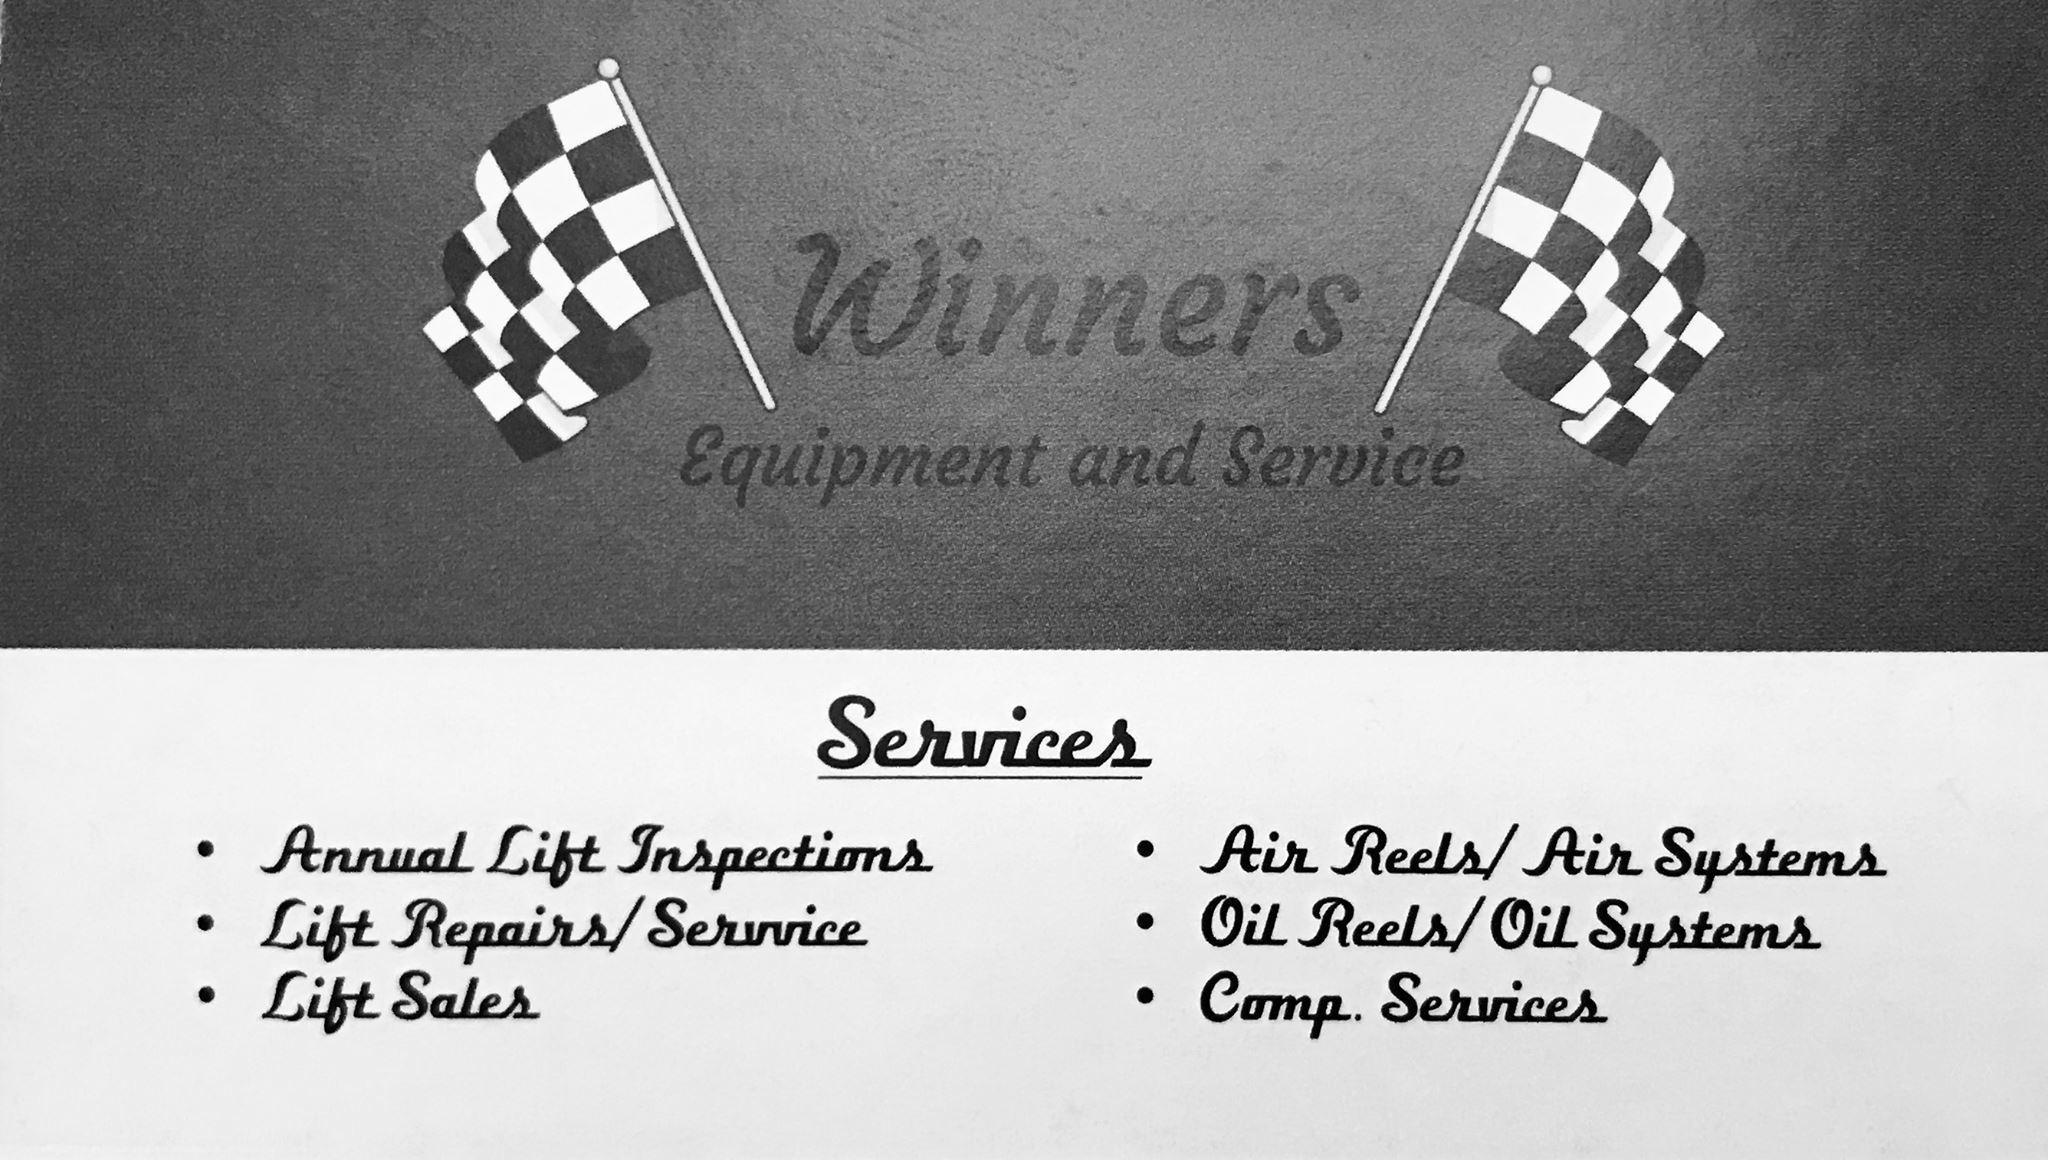 Winners Equipment and Service - Modesto, CA 95350 - (209)480-6066 | ShowMeLocal.com